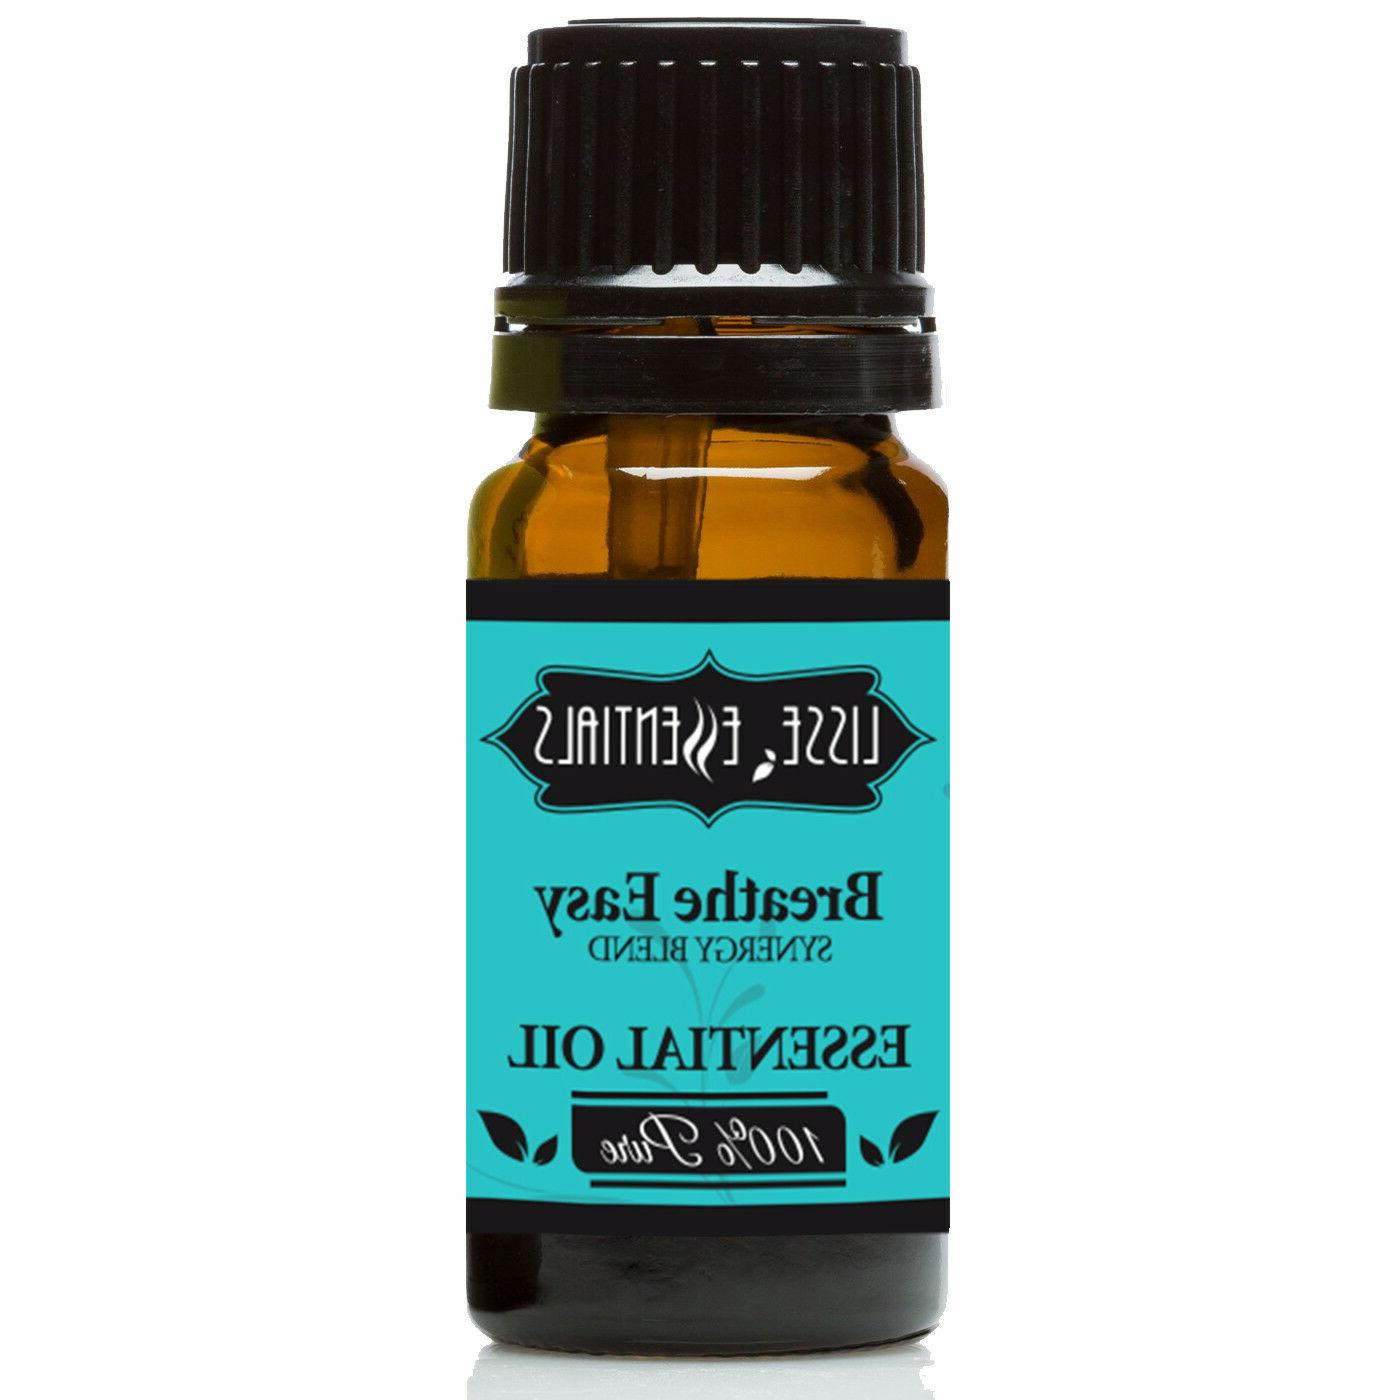 breathe easy synergy blend essential oil 100